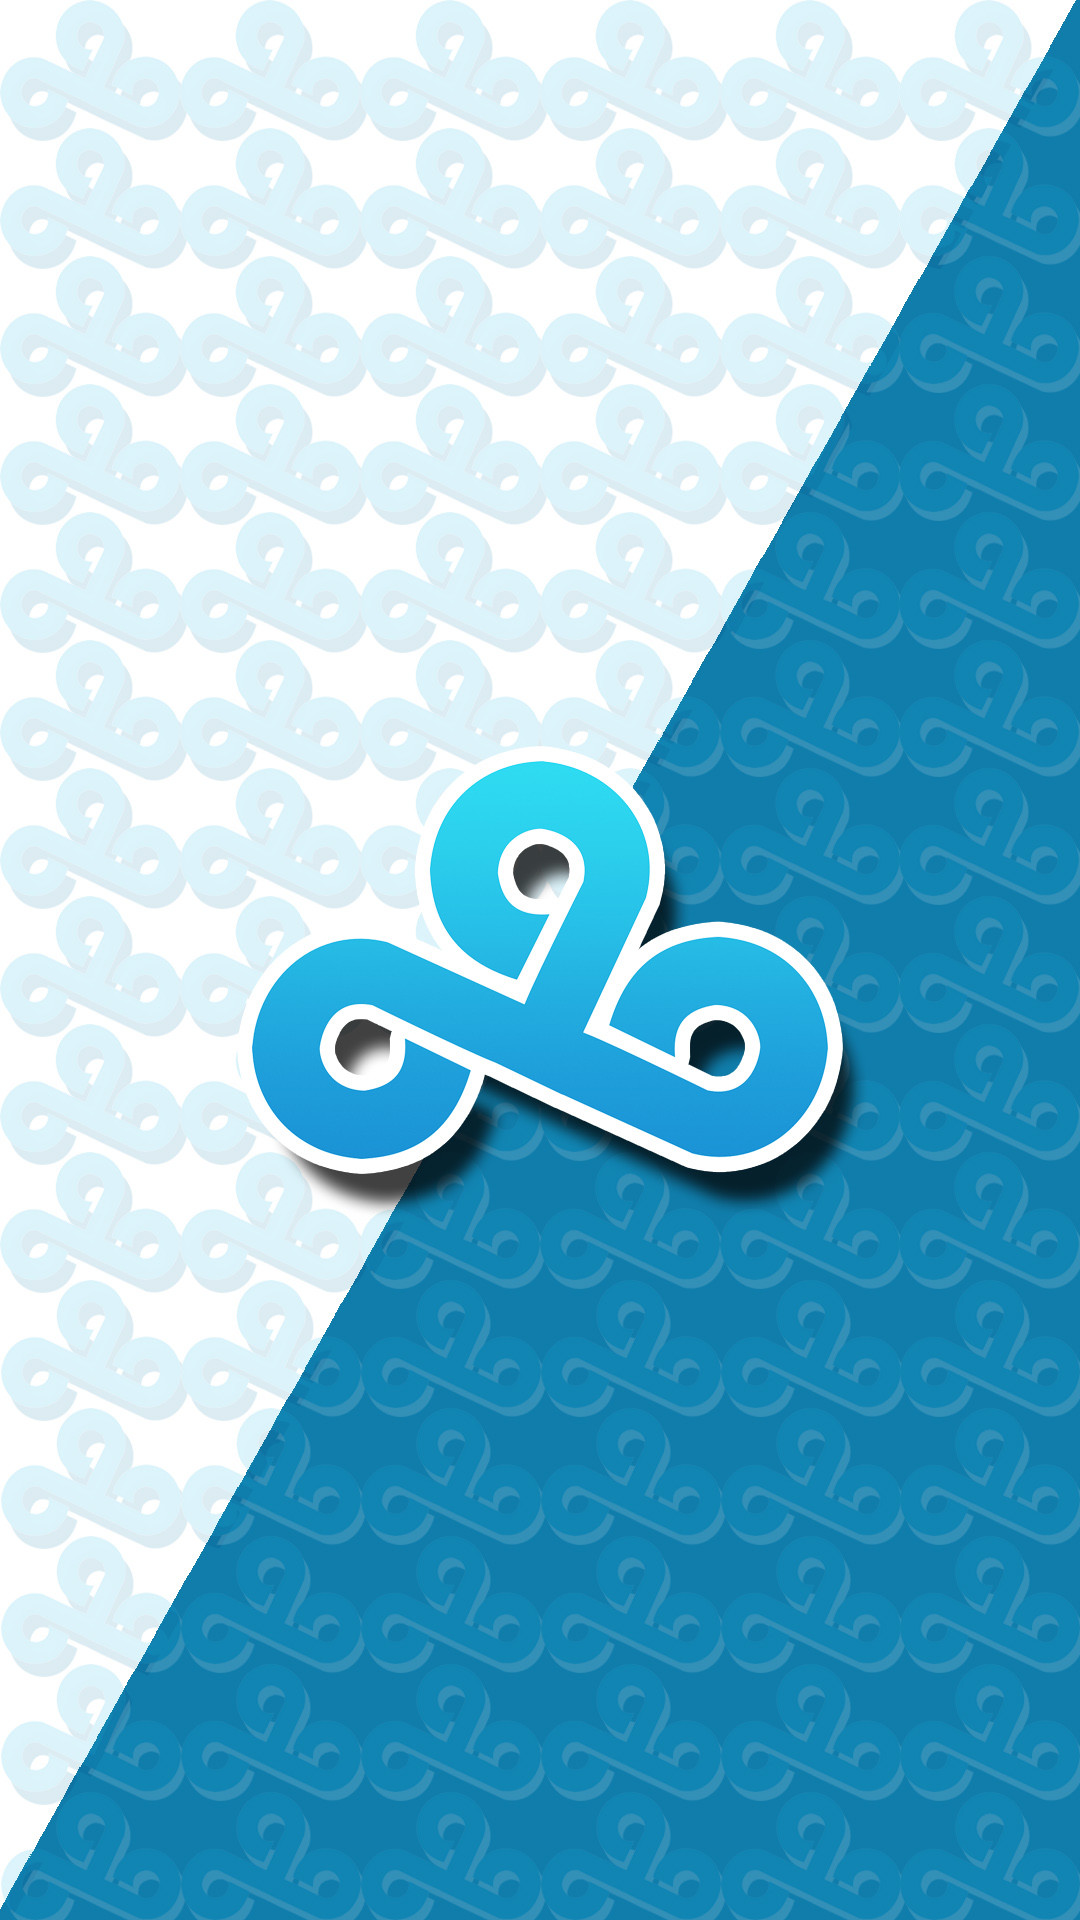 C9 Iphone Wallpaper Cloud 9 Iphone Wallpaper 73 Images